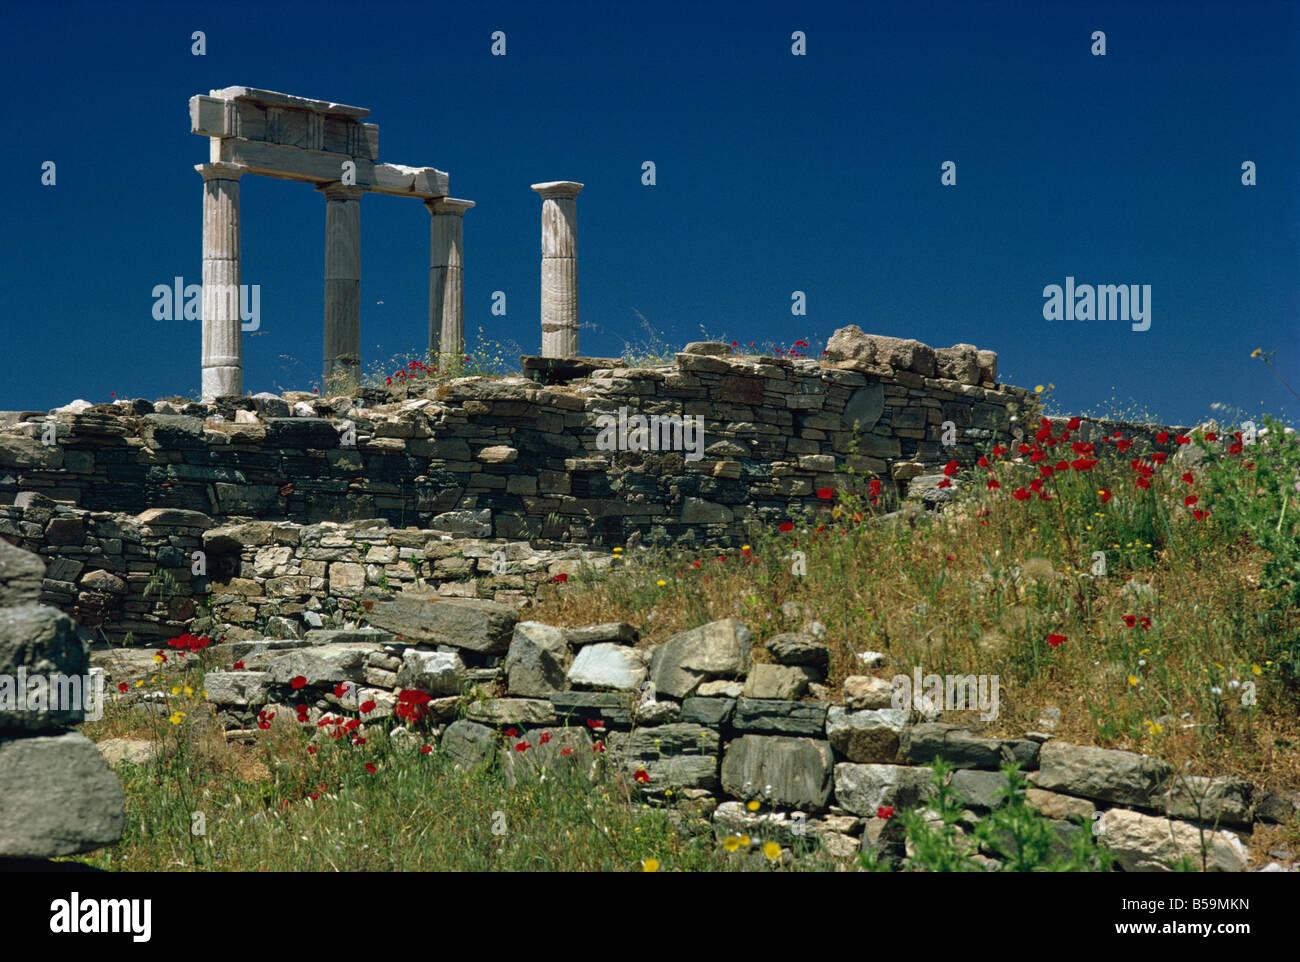 Temple of Apollo, Delos, UNESCO World Heritage Site, Greek Islands, Greece, Europe - Stock Image